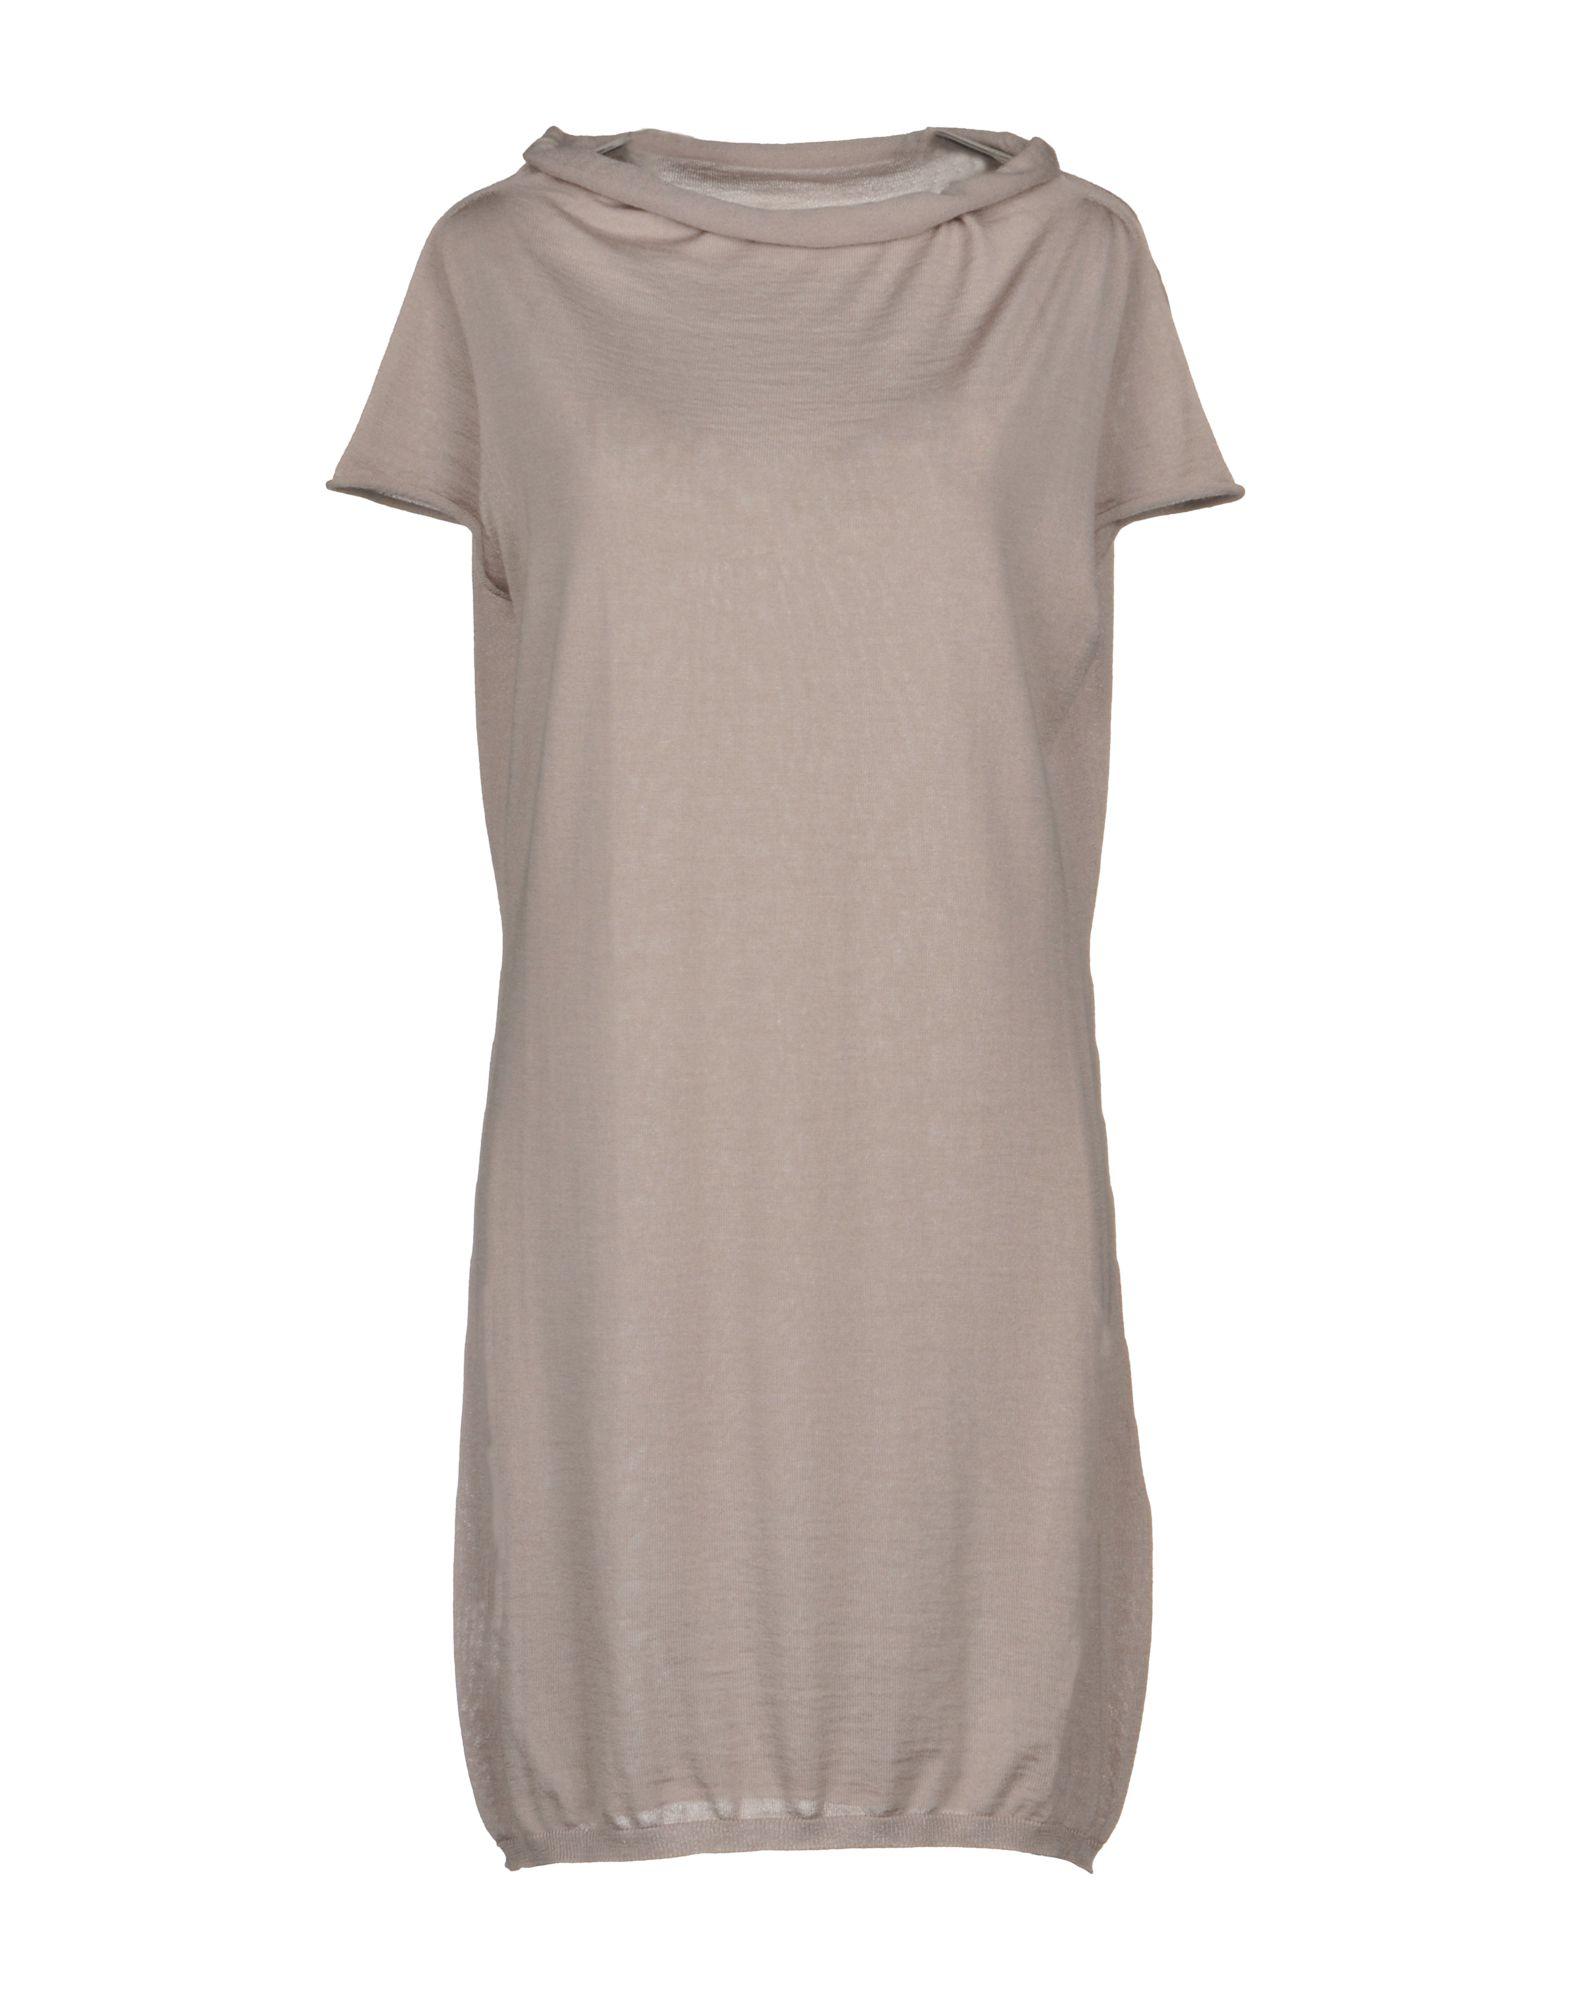 TABARONI CASHMERE Короткое платье tabaroni cashmere свитер